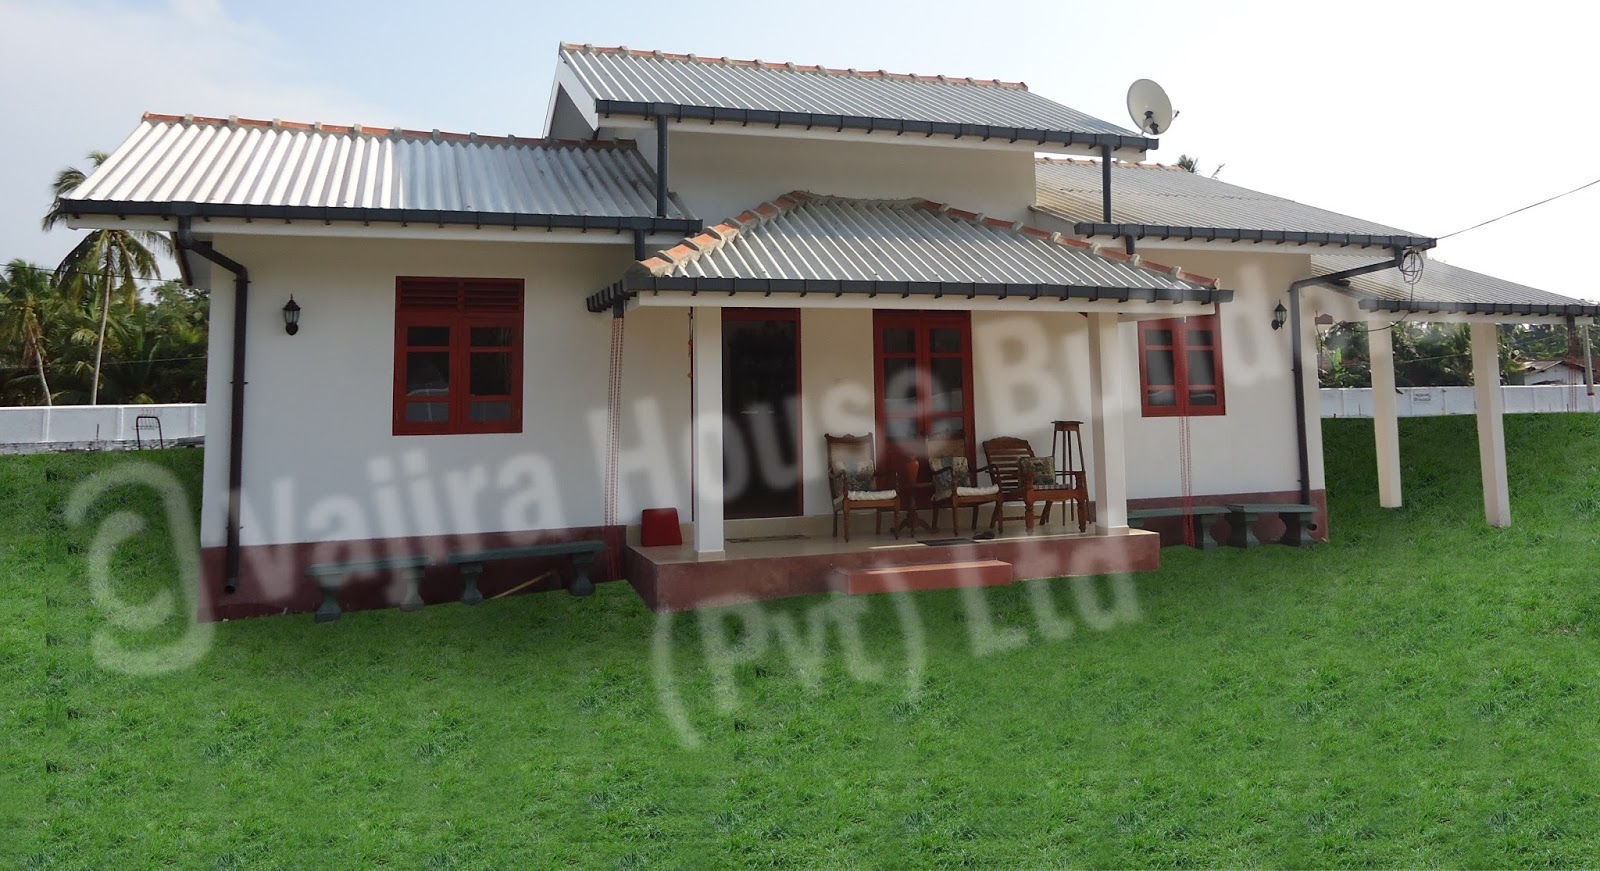 Vajira house plans sri lanka house and home design for New home designs sri lanka